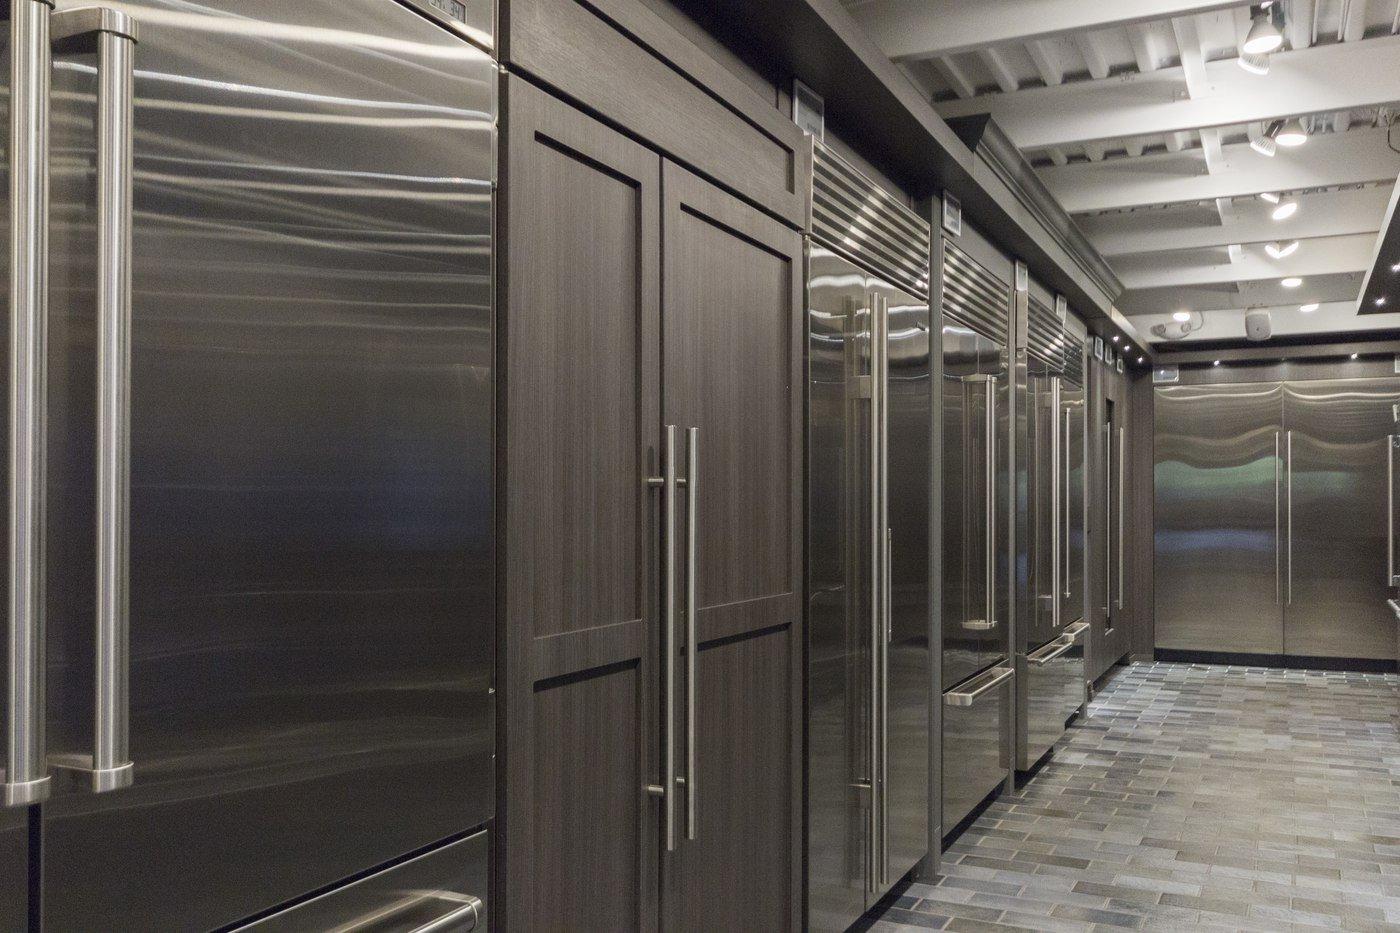 yale appliance large refrigerator display